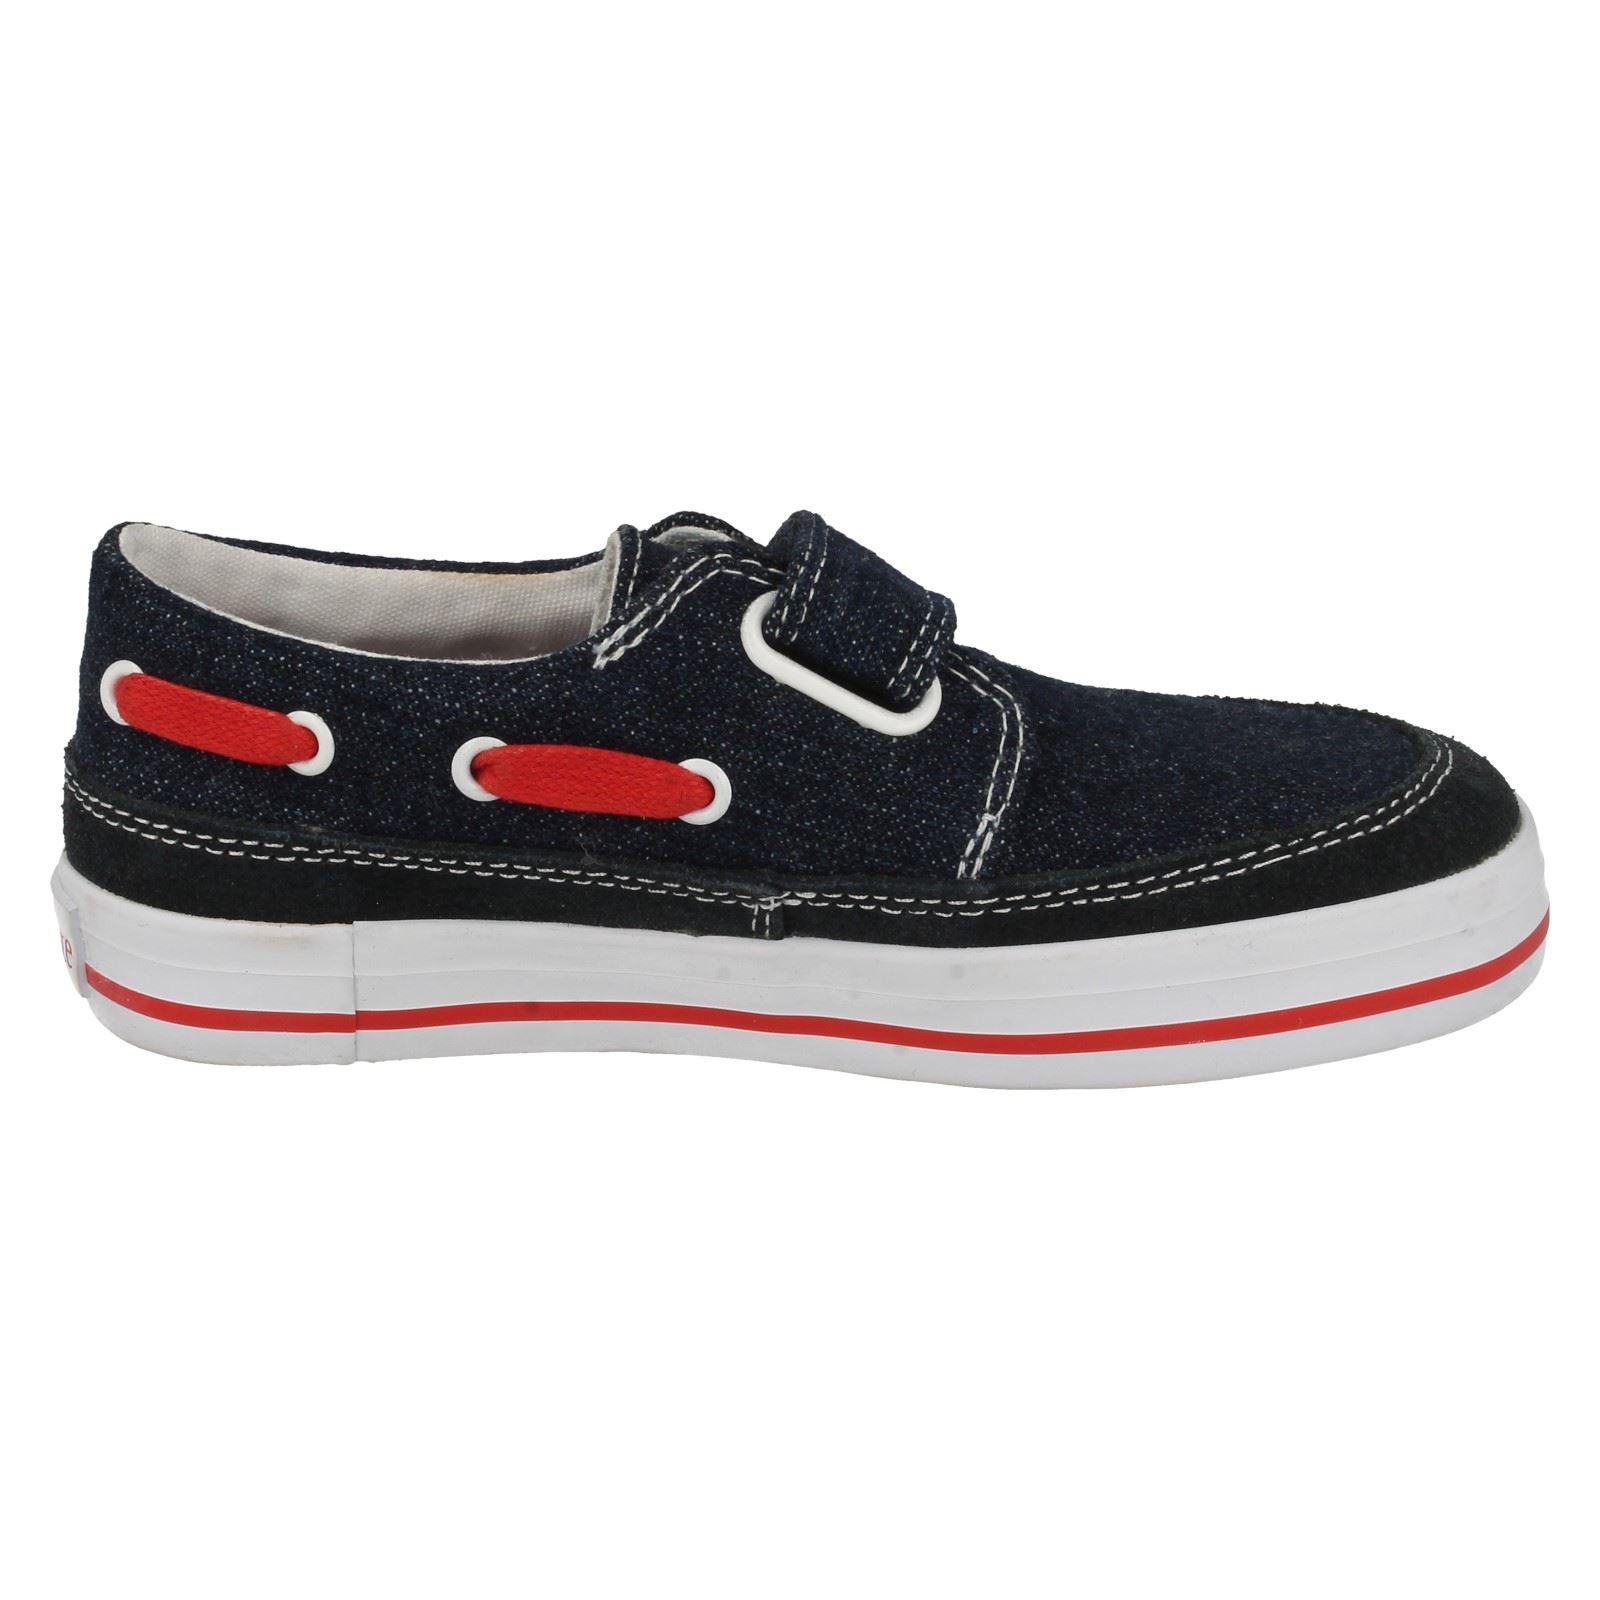 boys startrite canvas shoes ahoy ebay